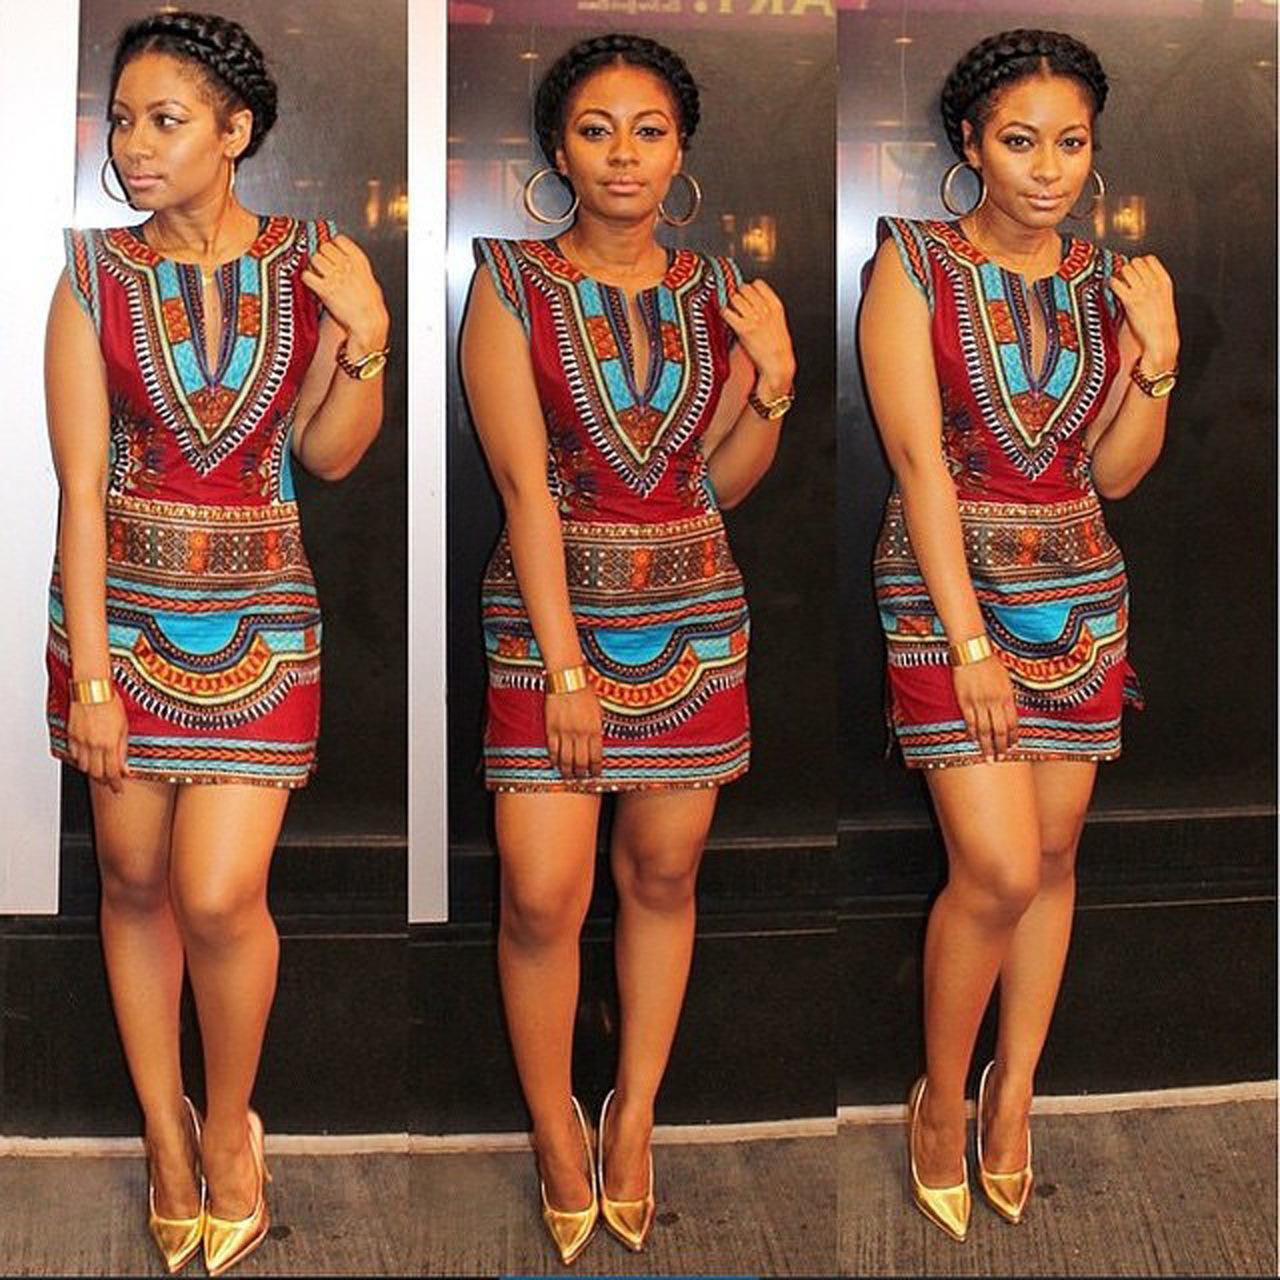 Nigerian fashion styles for women - Summer Fashion Nigerian Style Women Short Sleeve Tribal Print Mini Dress Vintage Sexy Ethnic Geometric Bodycon Casual Dress Robe Femme 22462 Tribal Print